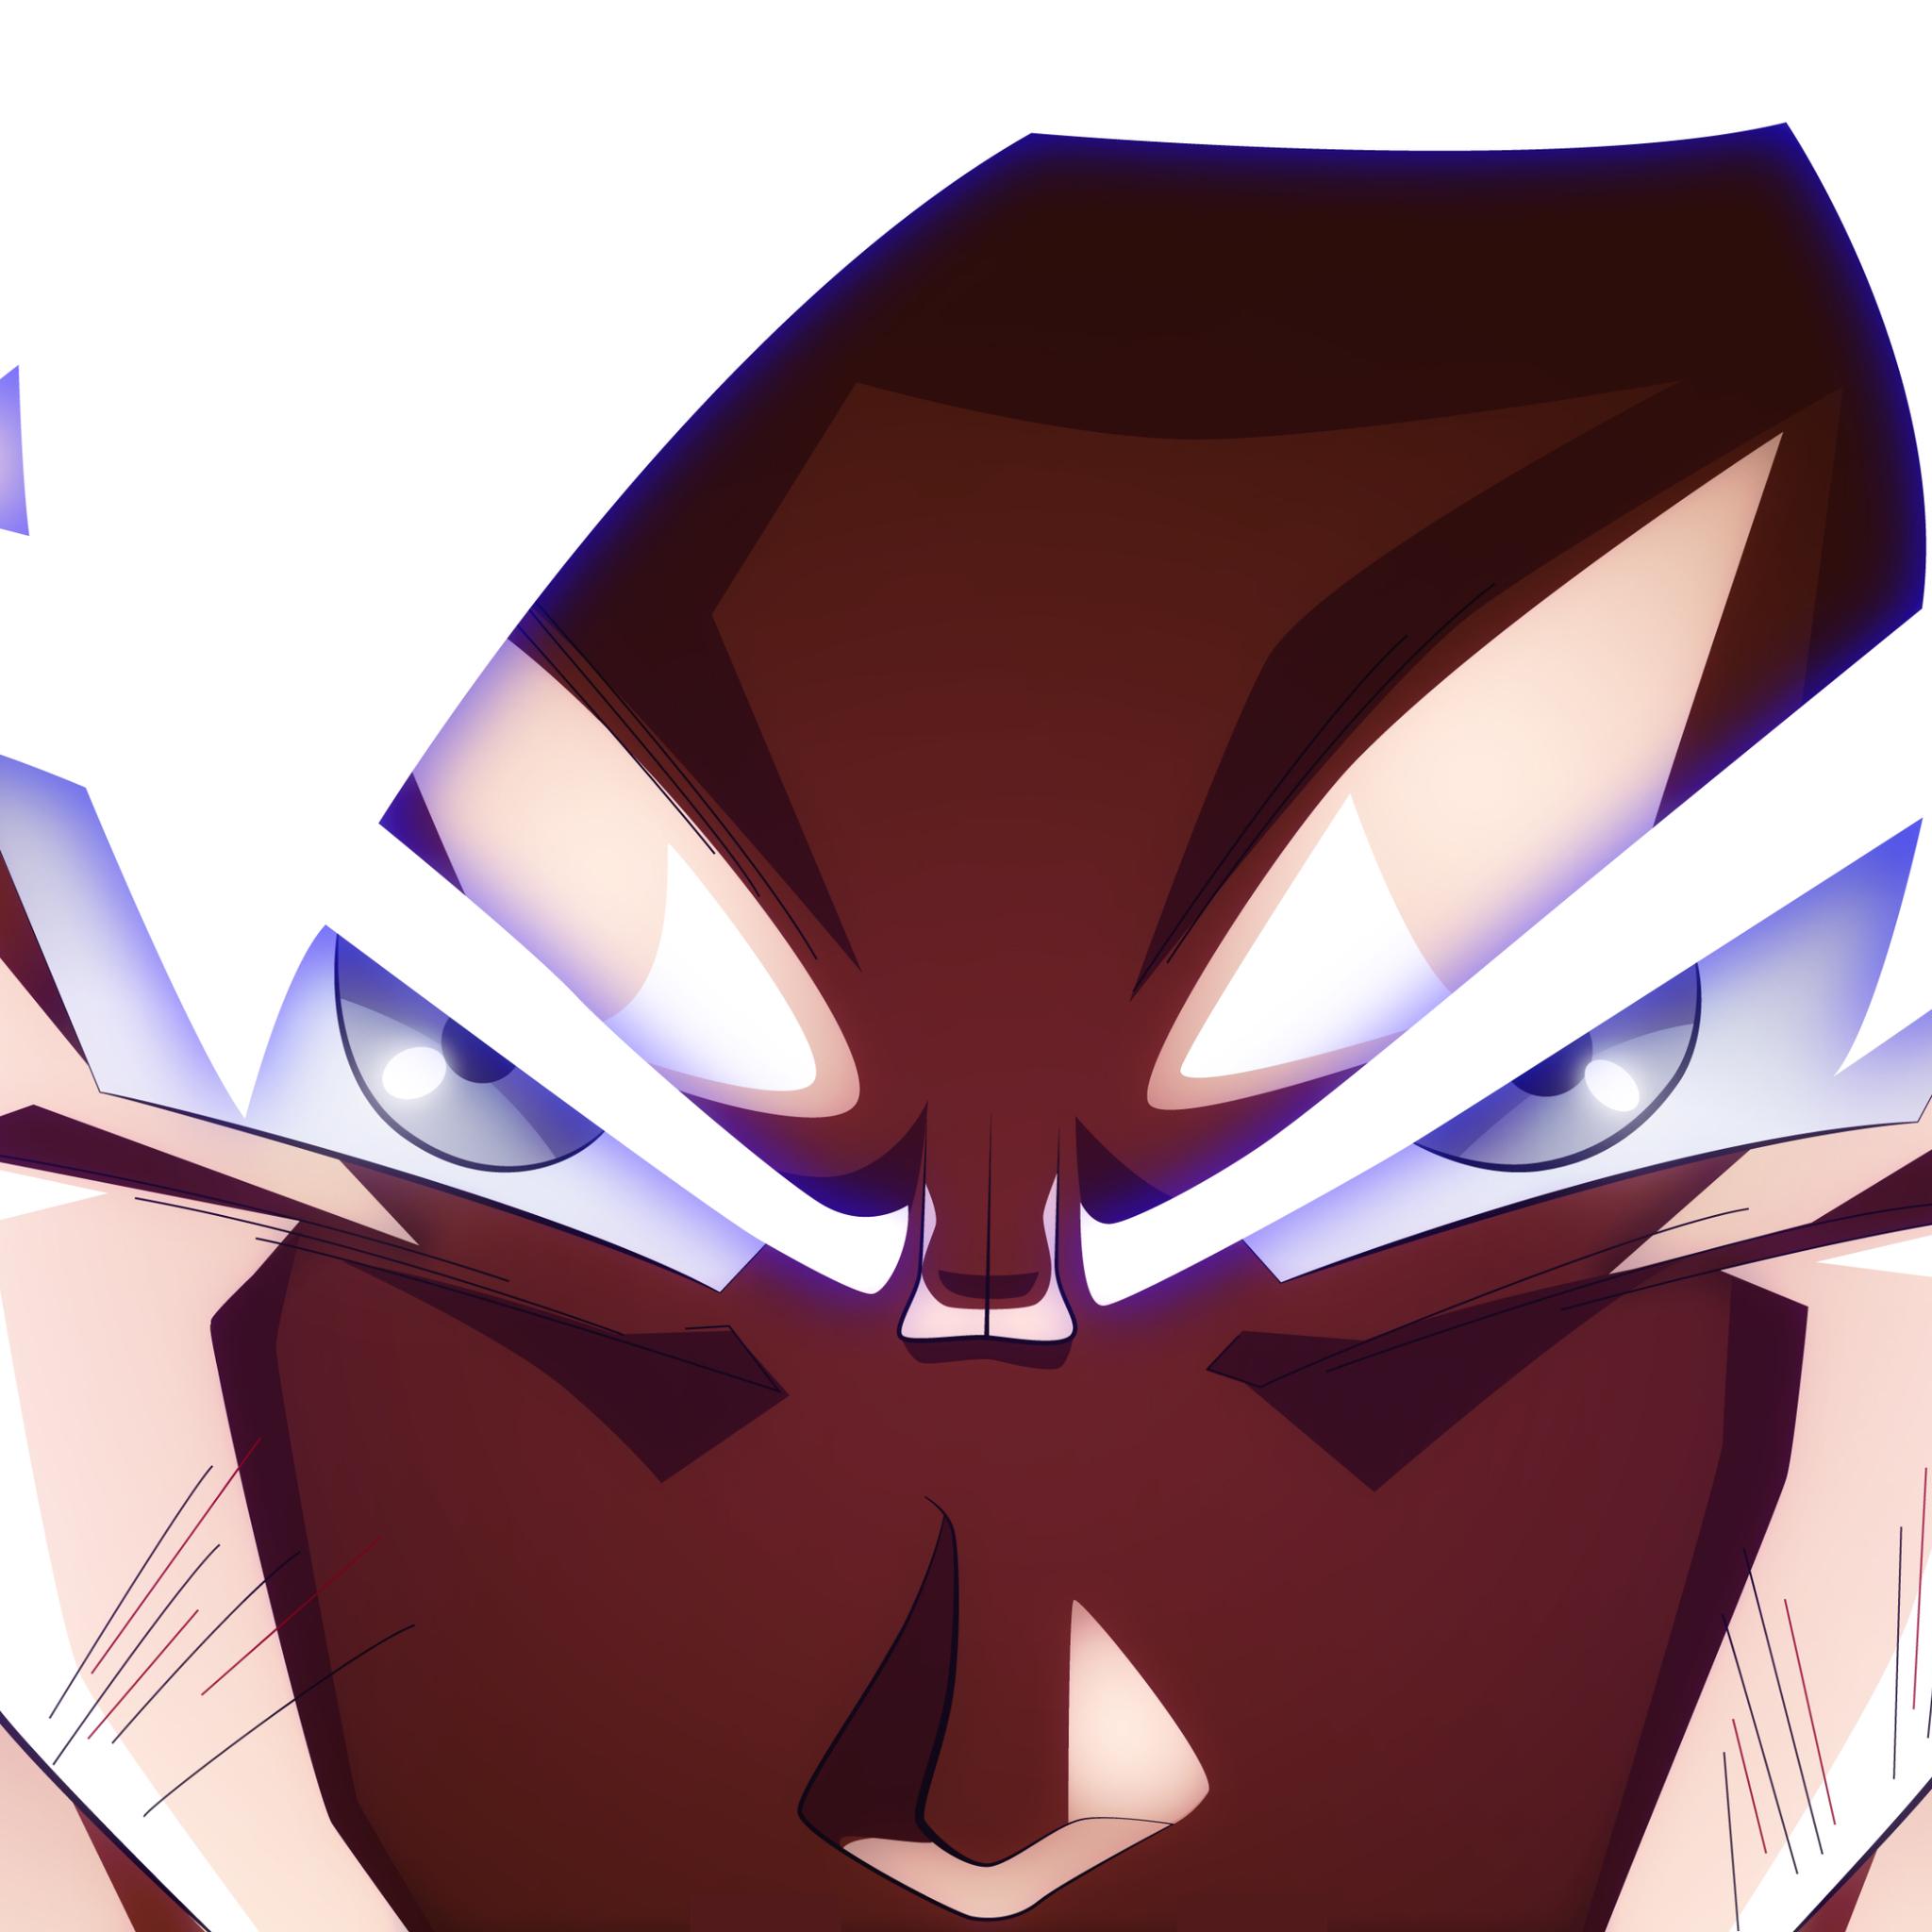 4k Wallpaper Dragon Ball: 2048x2048 Ultra Instinct Goku Ipad Air HD 4k Wallpapers